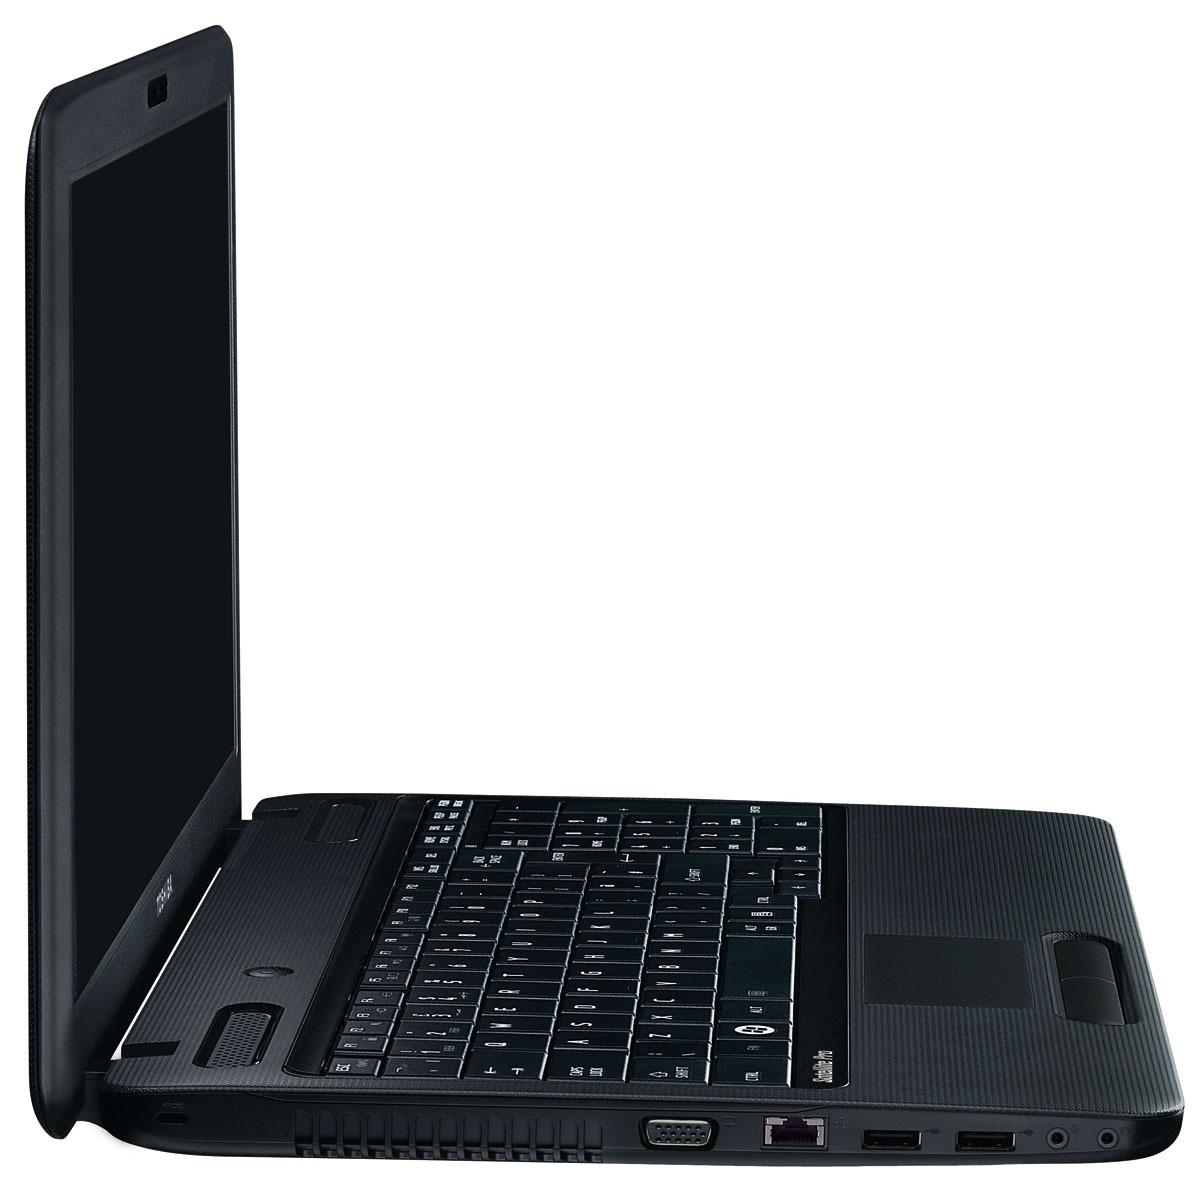 toshiba satellite pro c660 2cj pc portable toshiba sur. Black Bedroom Furniture Sets. Home Design Ideas